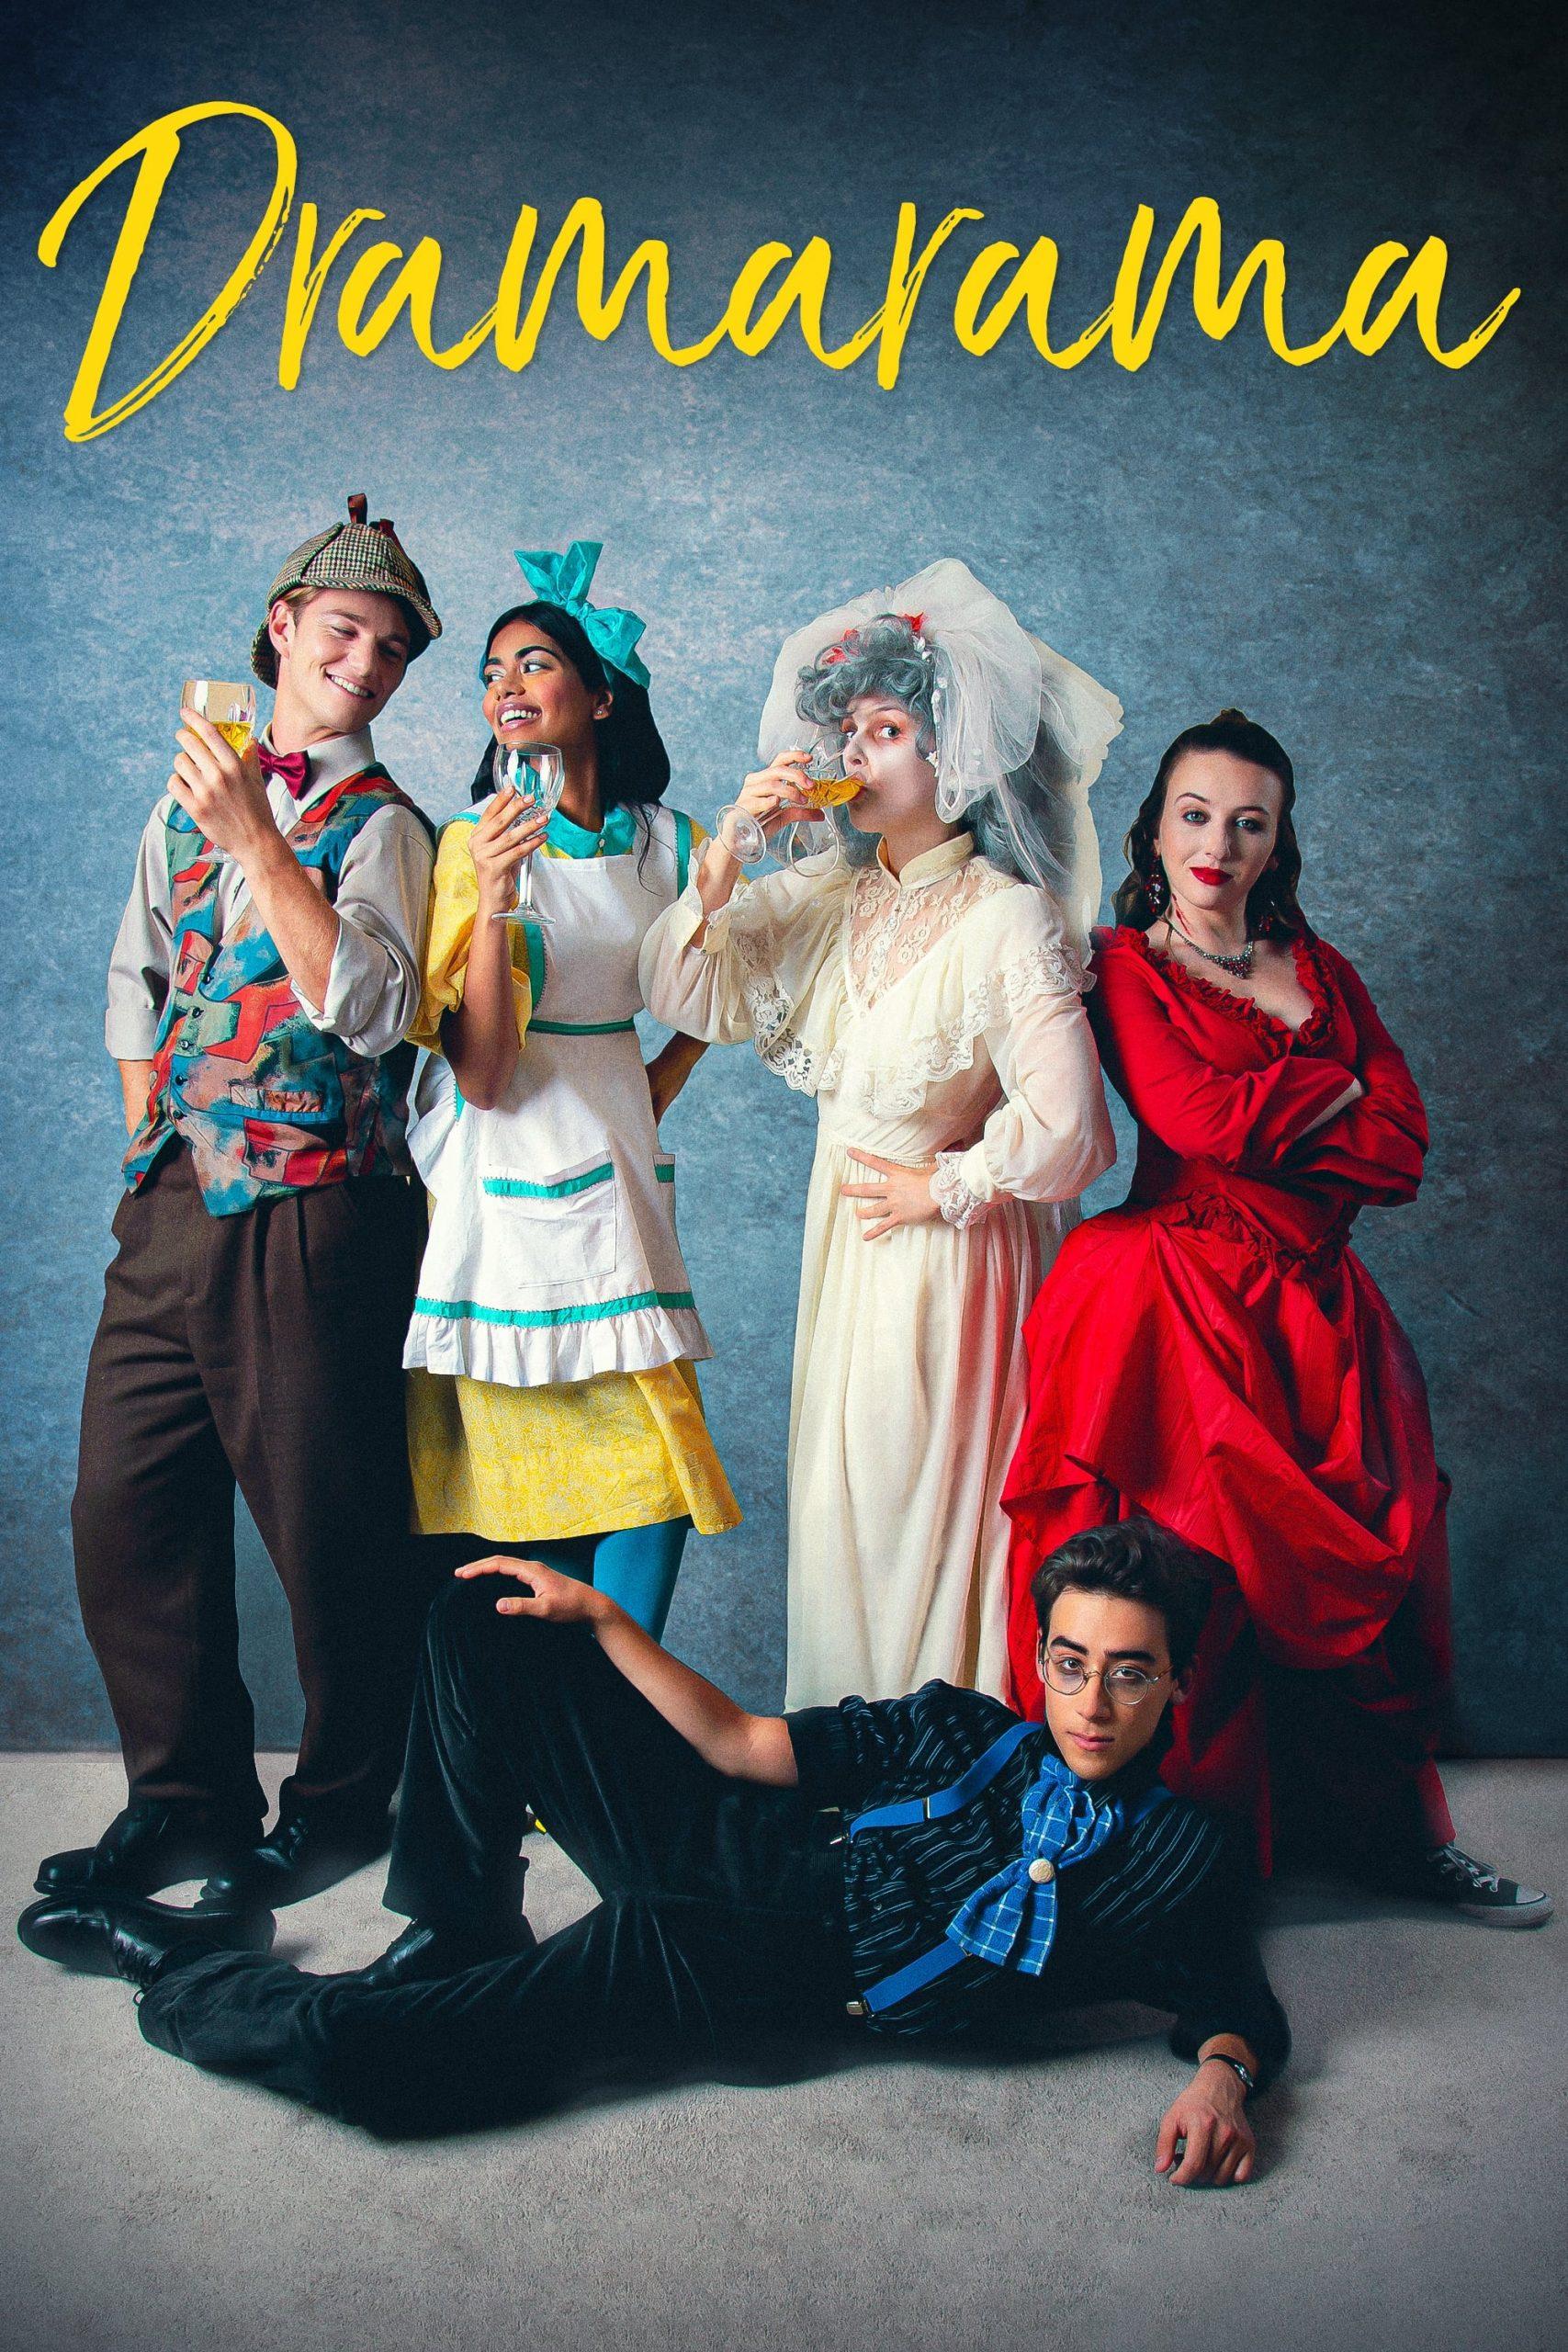 Poster for Dramarama